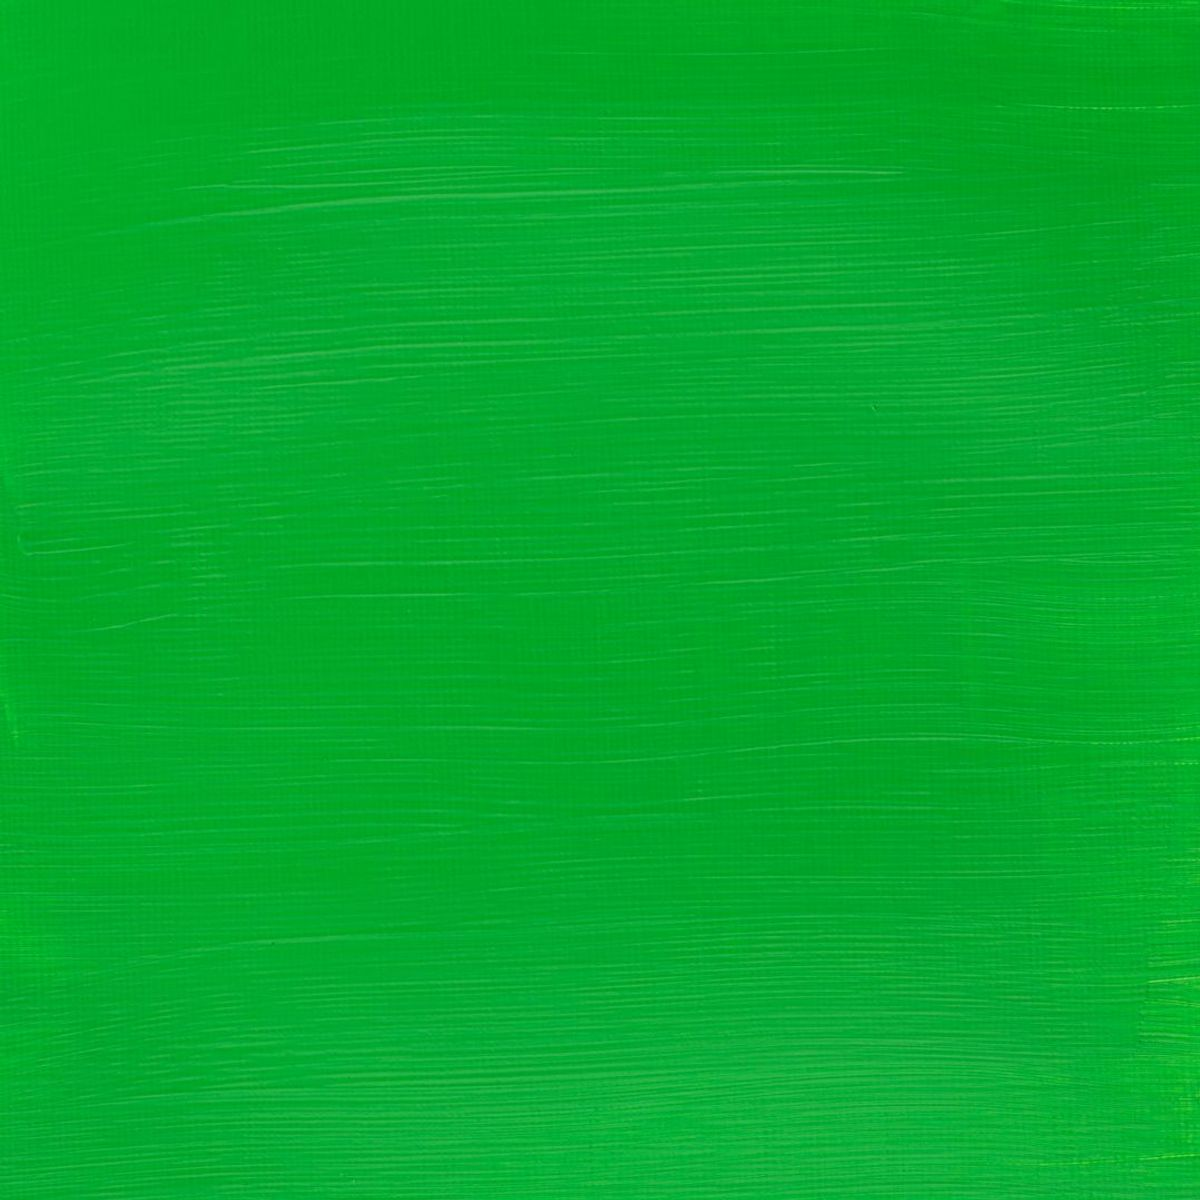 WINSOR AND NEWTON GALERIA ACRYLIC COLOUR - TUBE OF 60 ML - PERMANENT GREEN LIGHT (483)